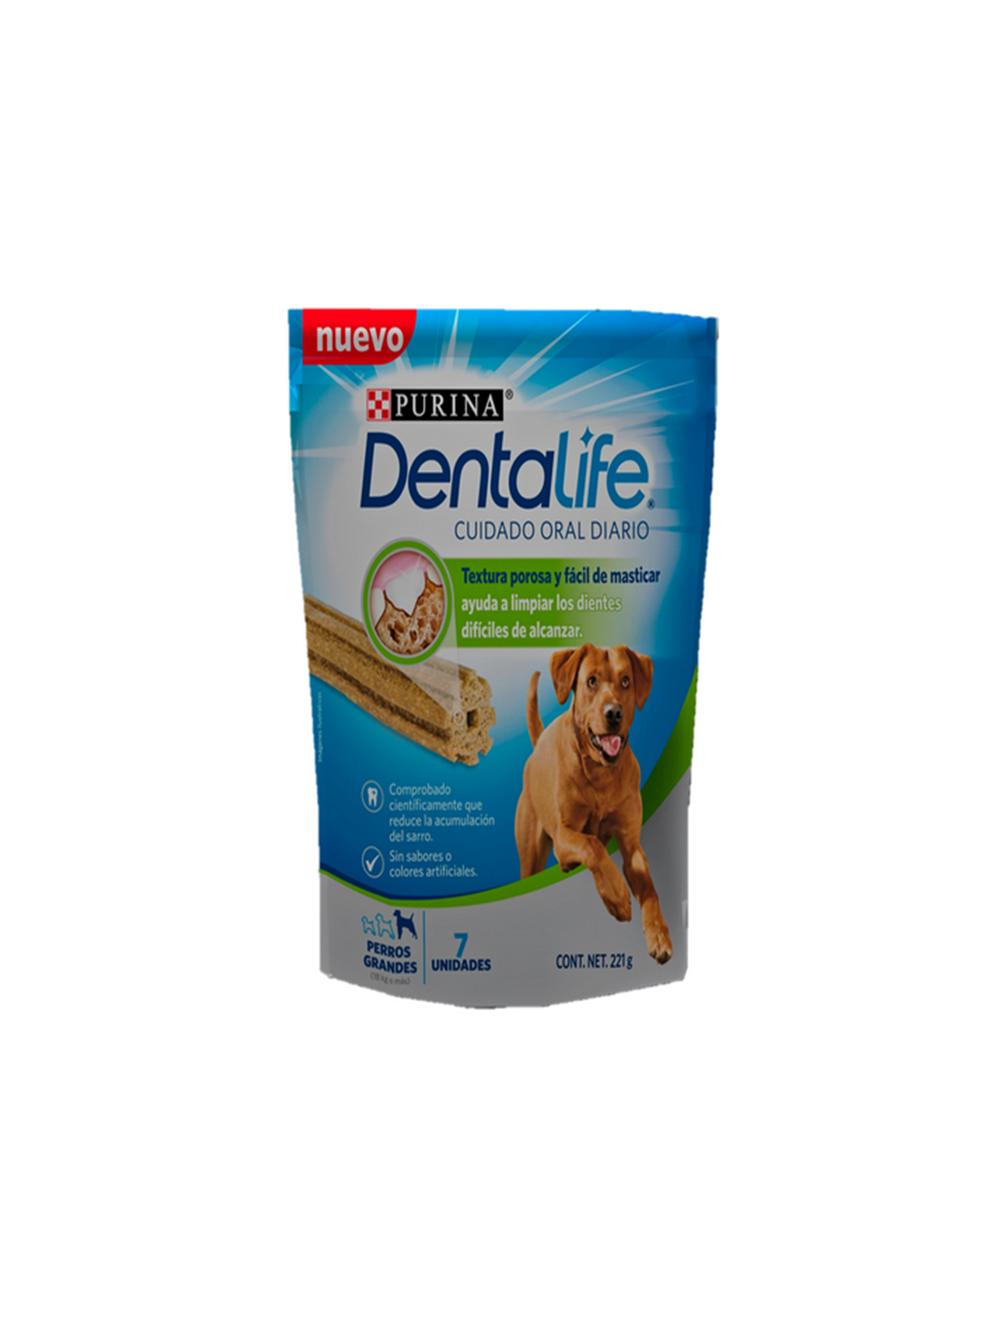 Snack Dentalife Large Dog Treat x 221g - ciudaddemascotas.com